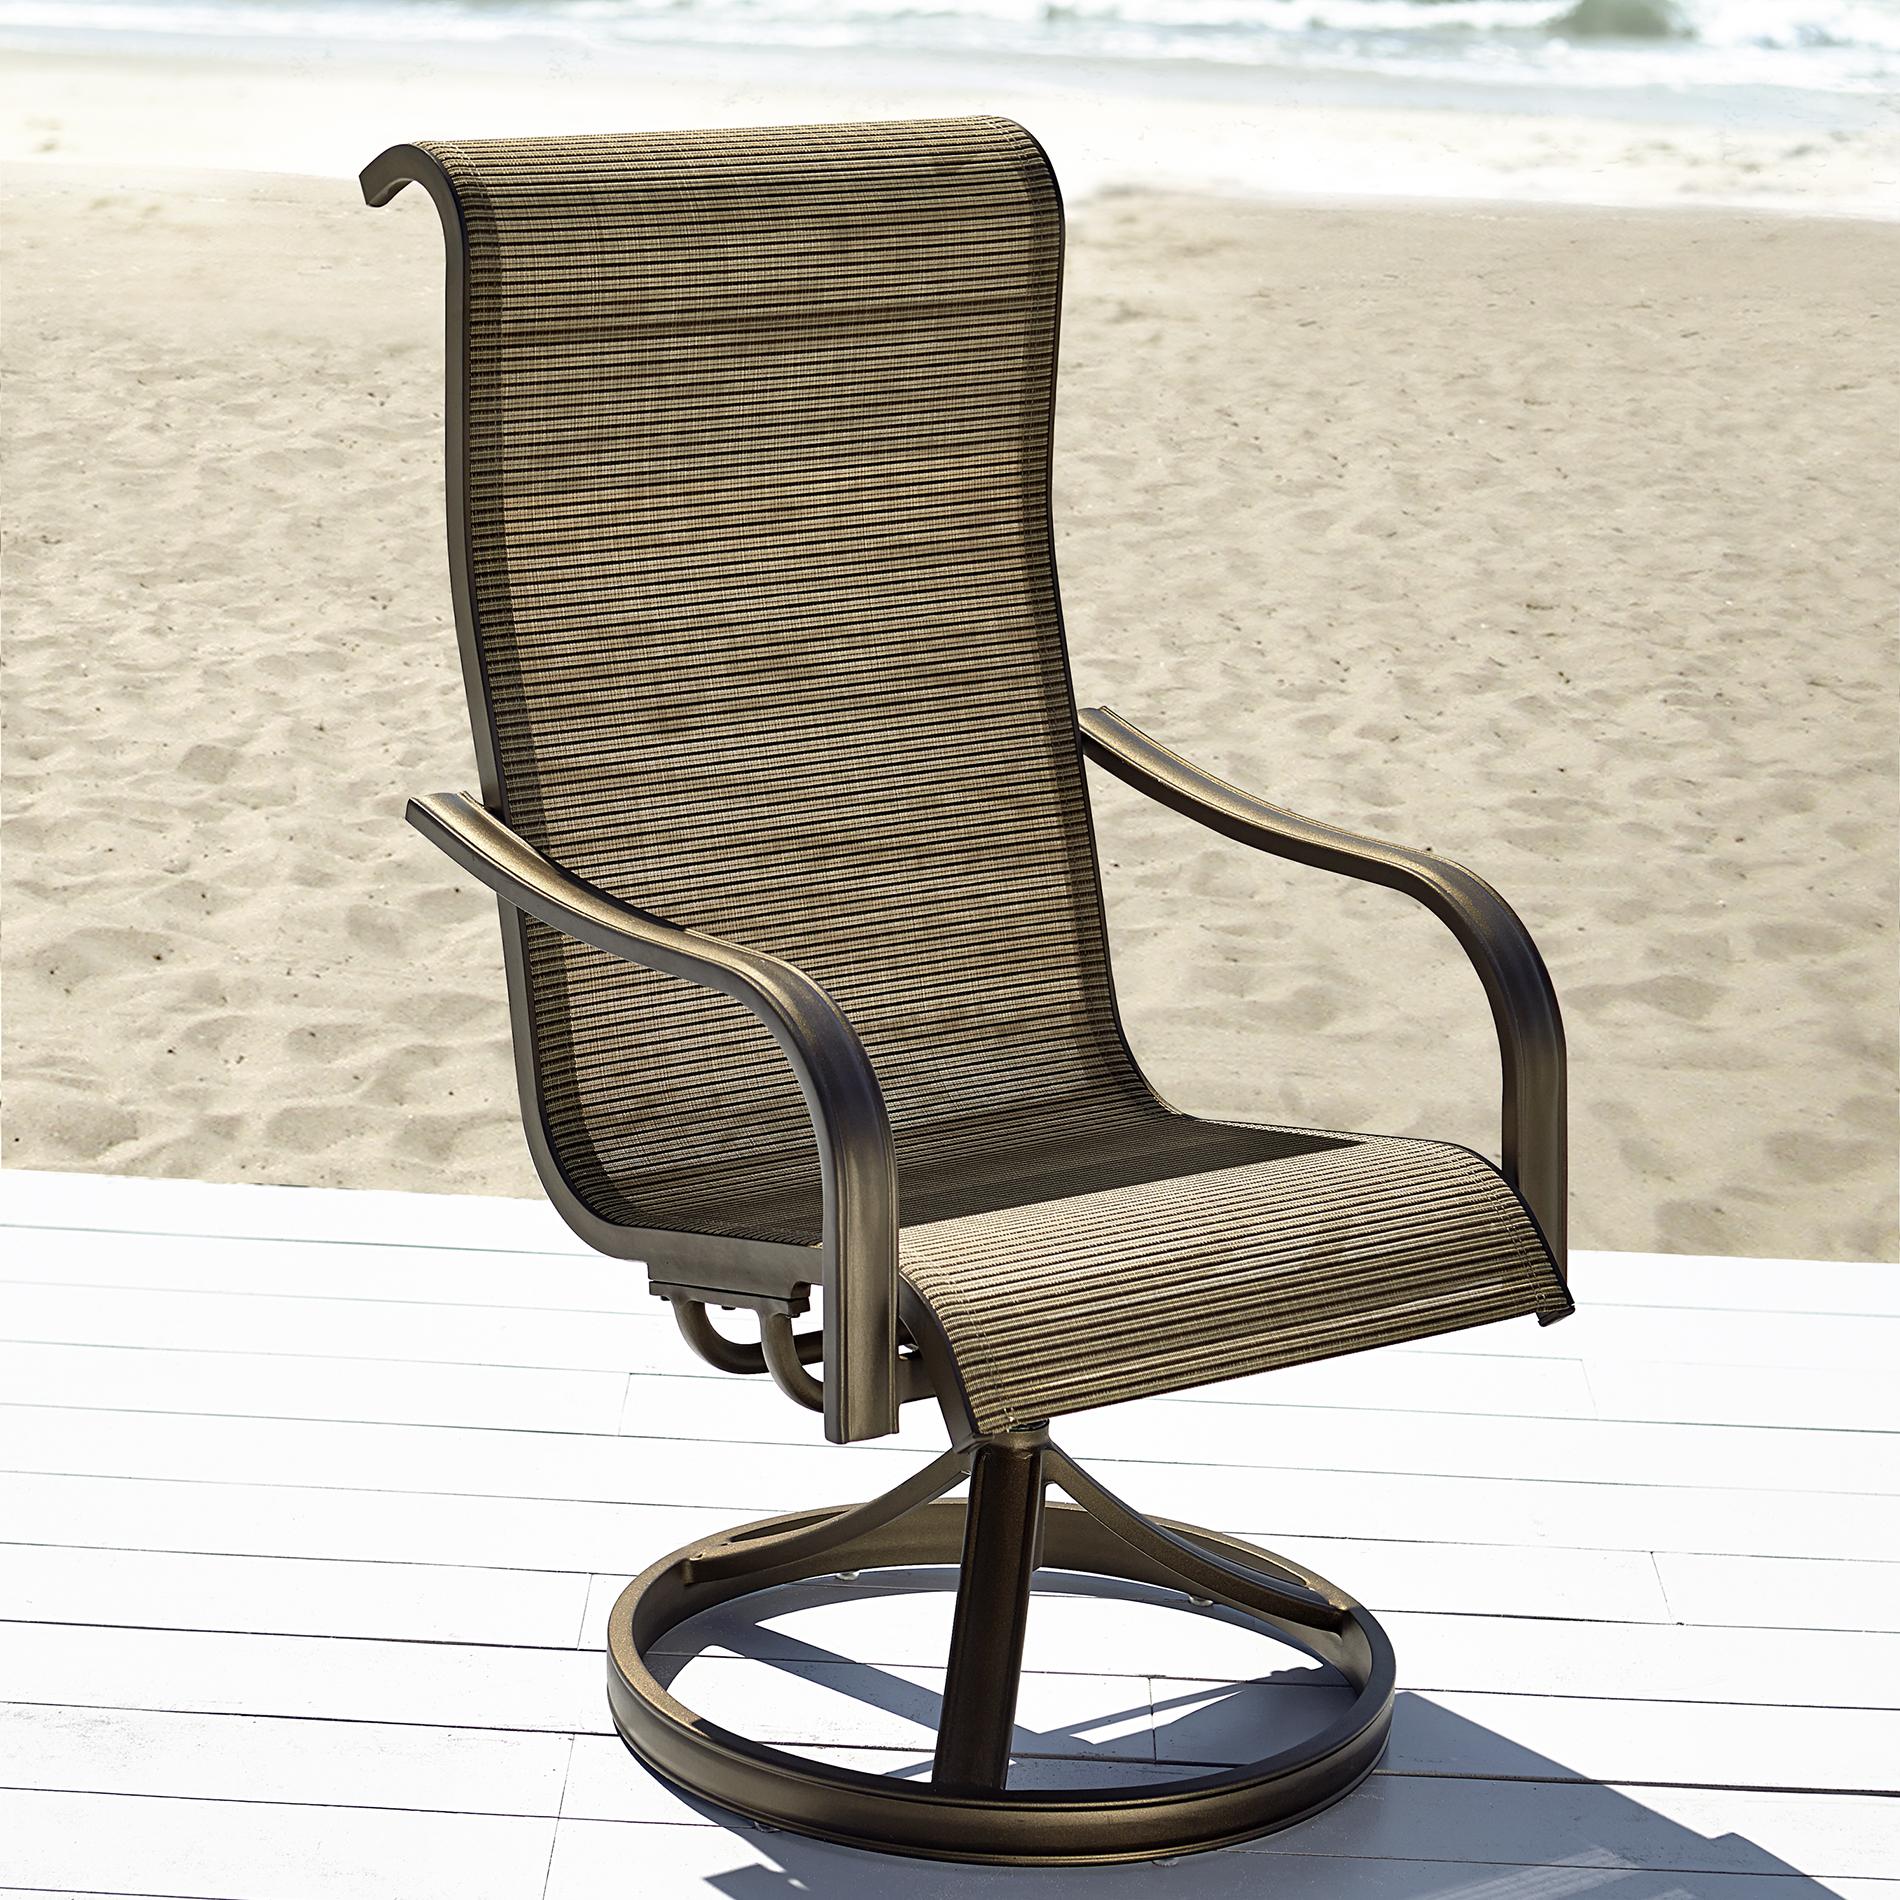 Grand Harbor Edgewater Single Swivel Chair - Outdoor